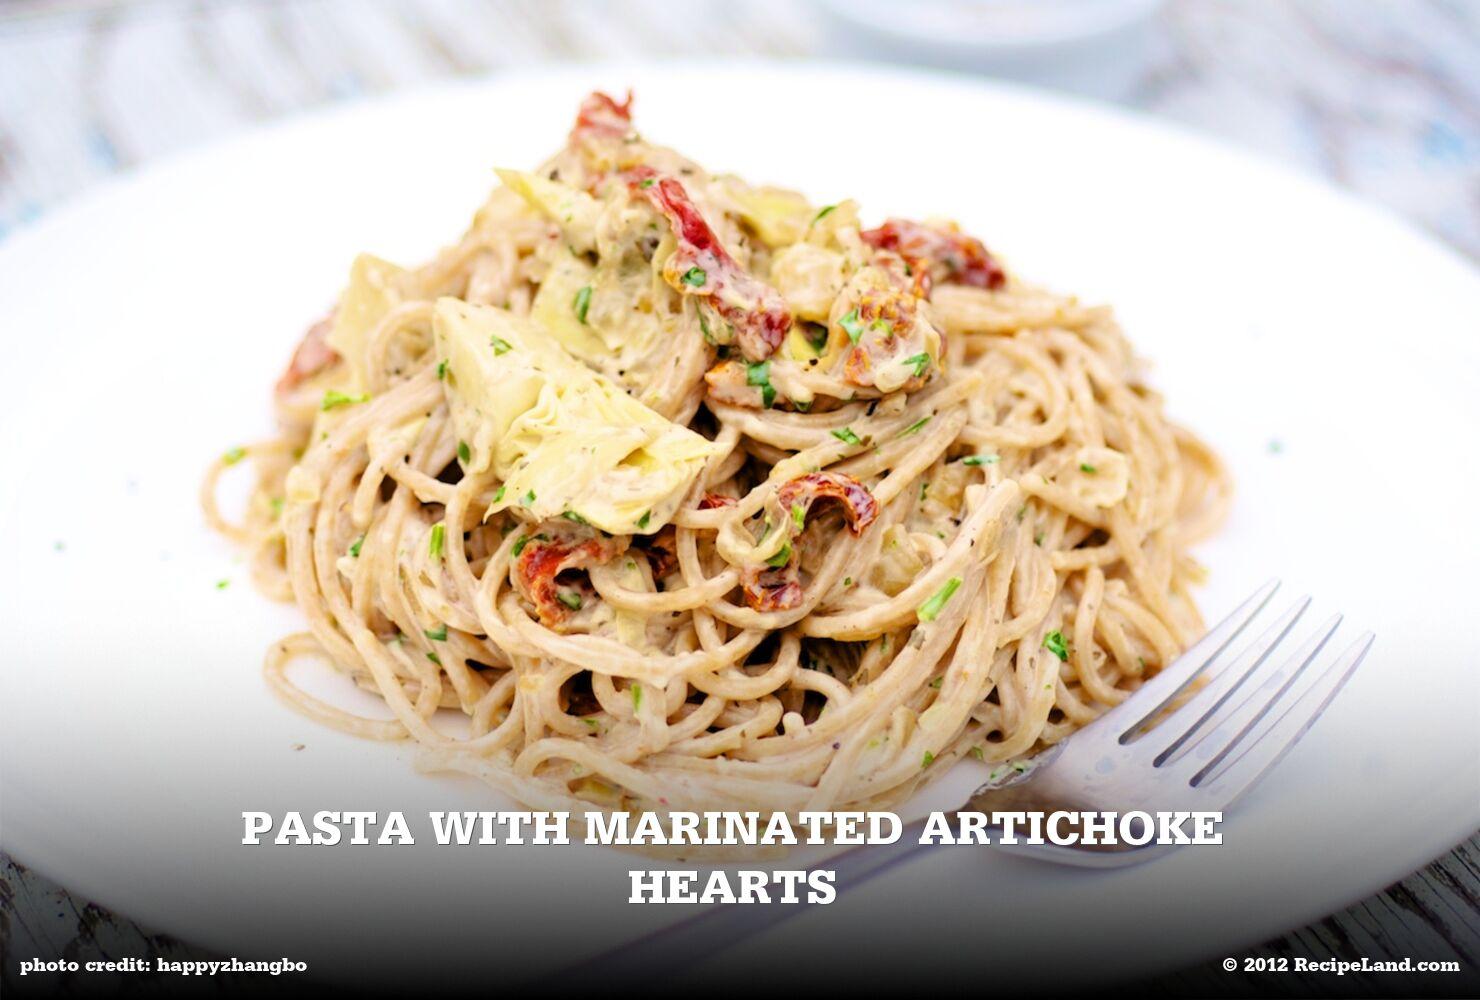 Pasta with Marinated Artichoke Hearts